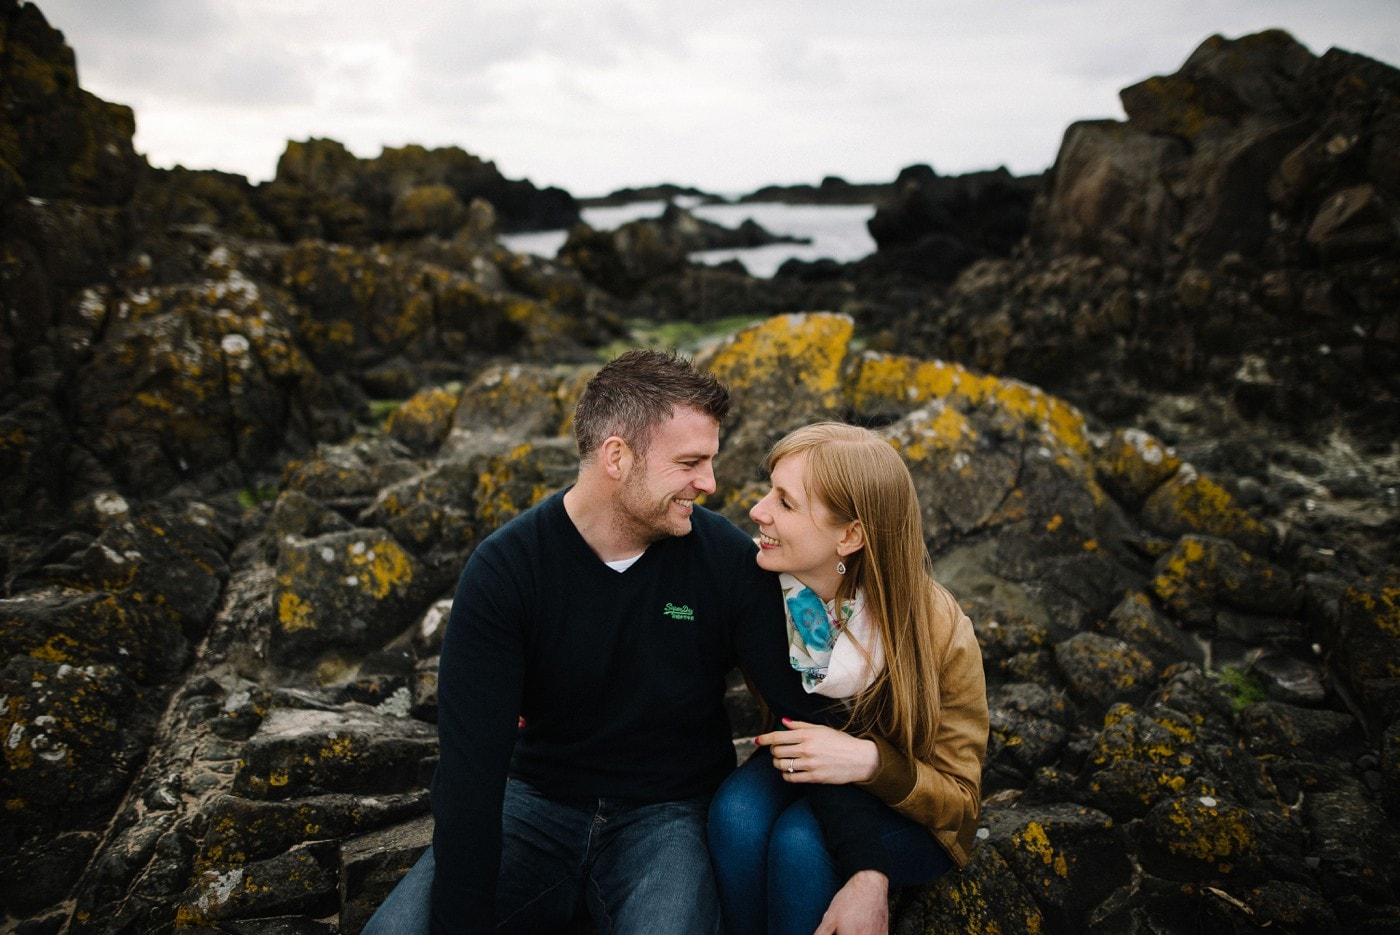 ballintoy-harbour-engagement-wedding-photographer-northern-ireland_0004